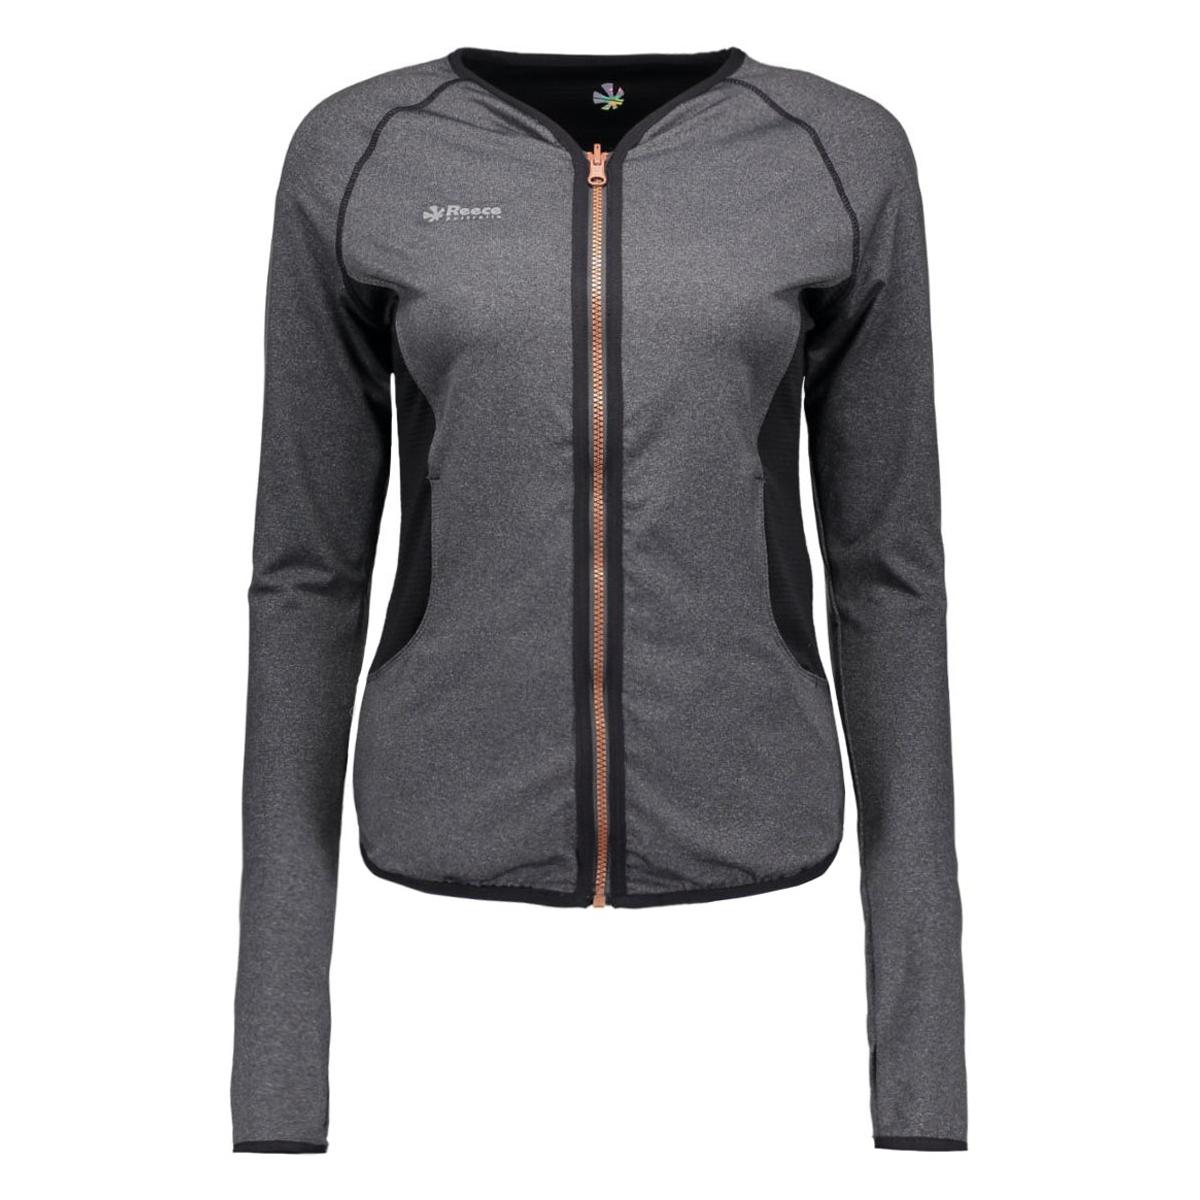 859604 amara reversible jacket reece sport jas 8990 black-grey